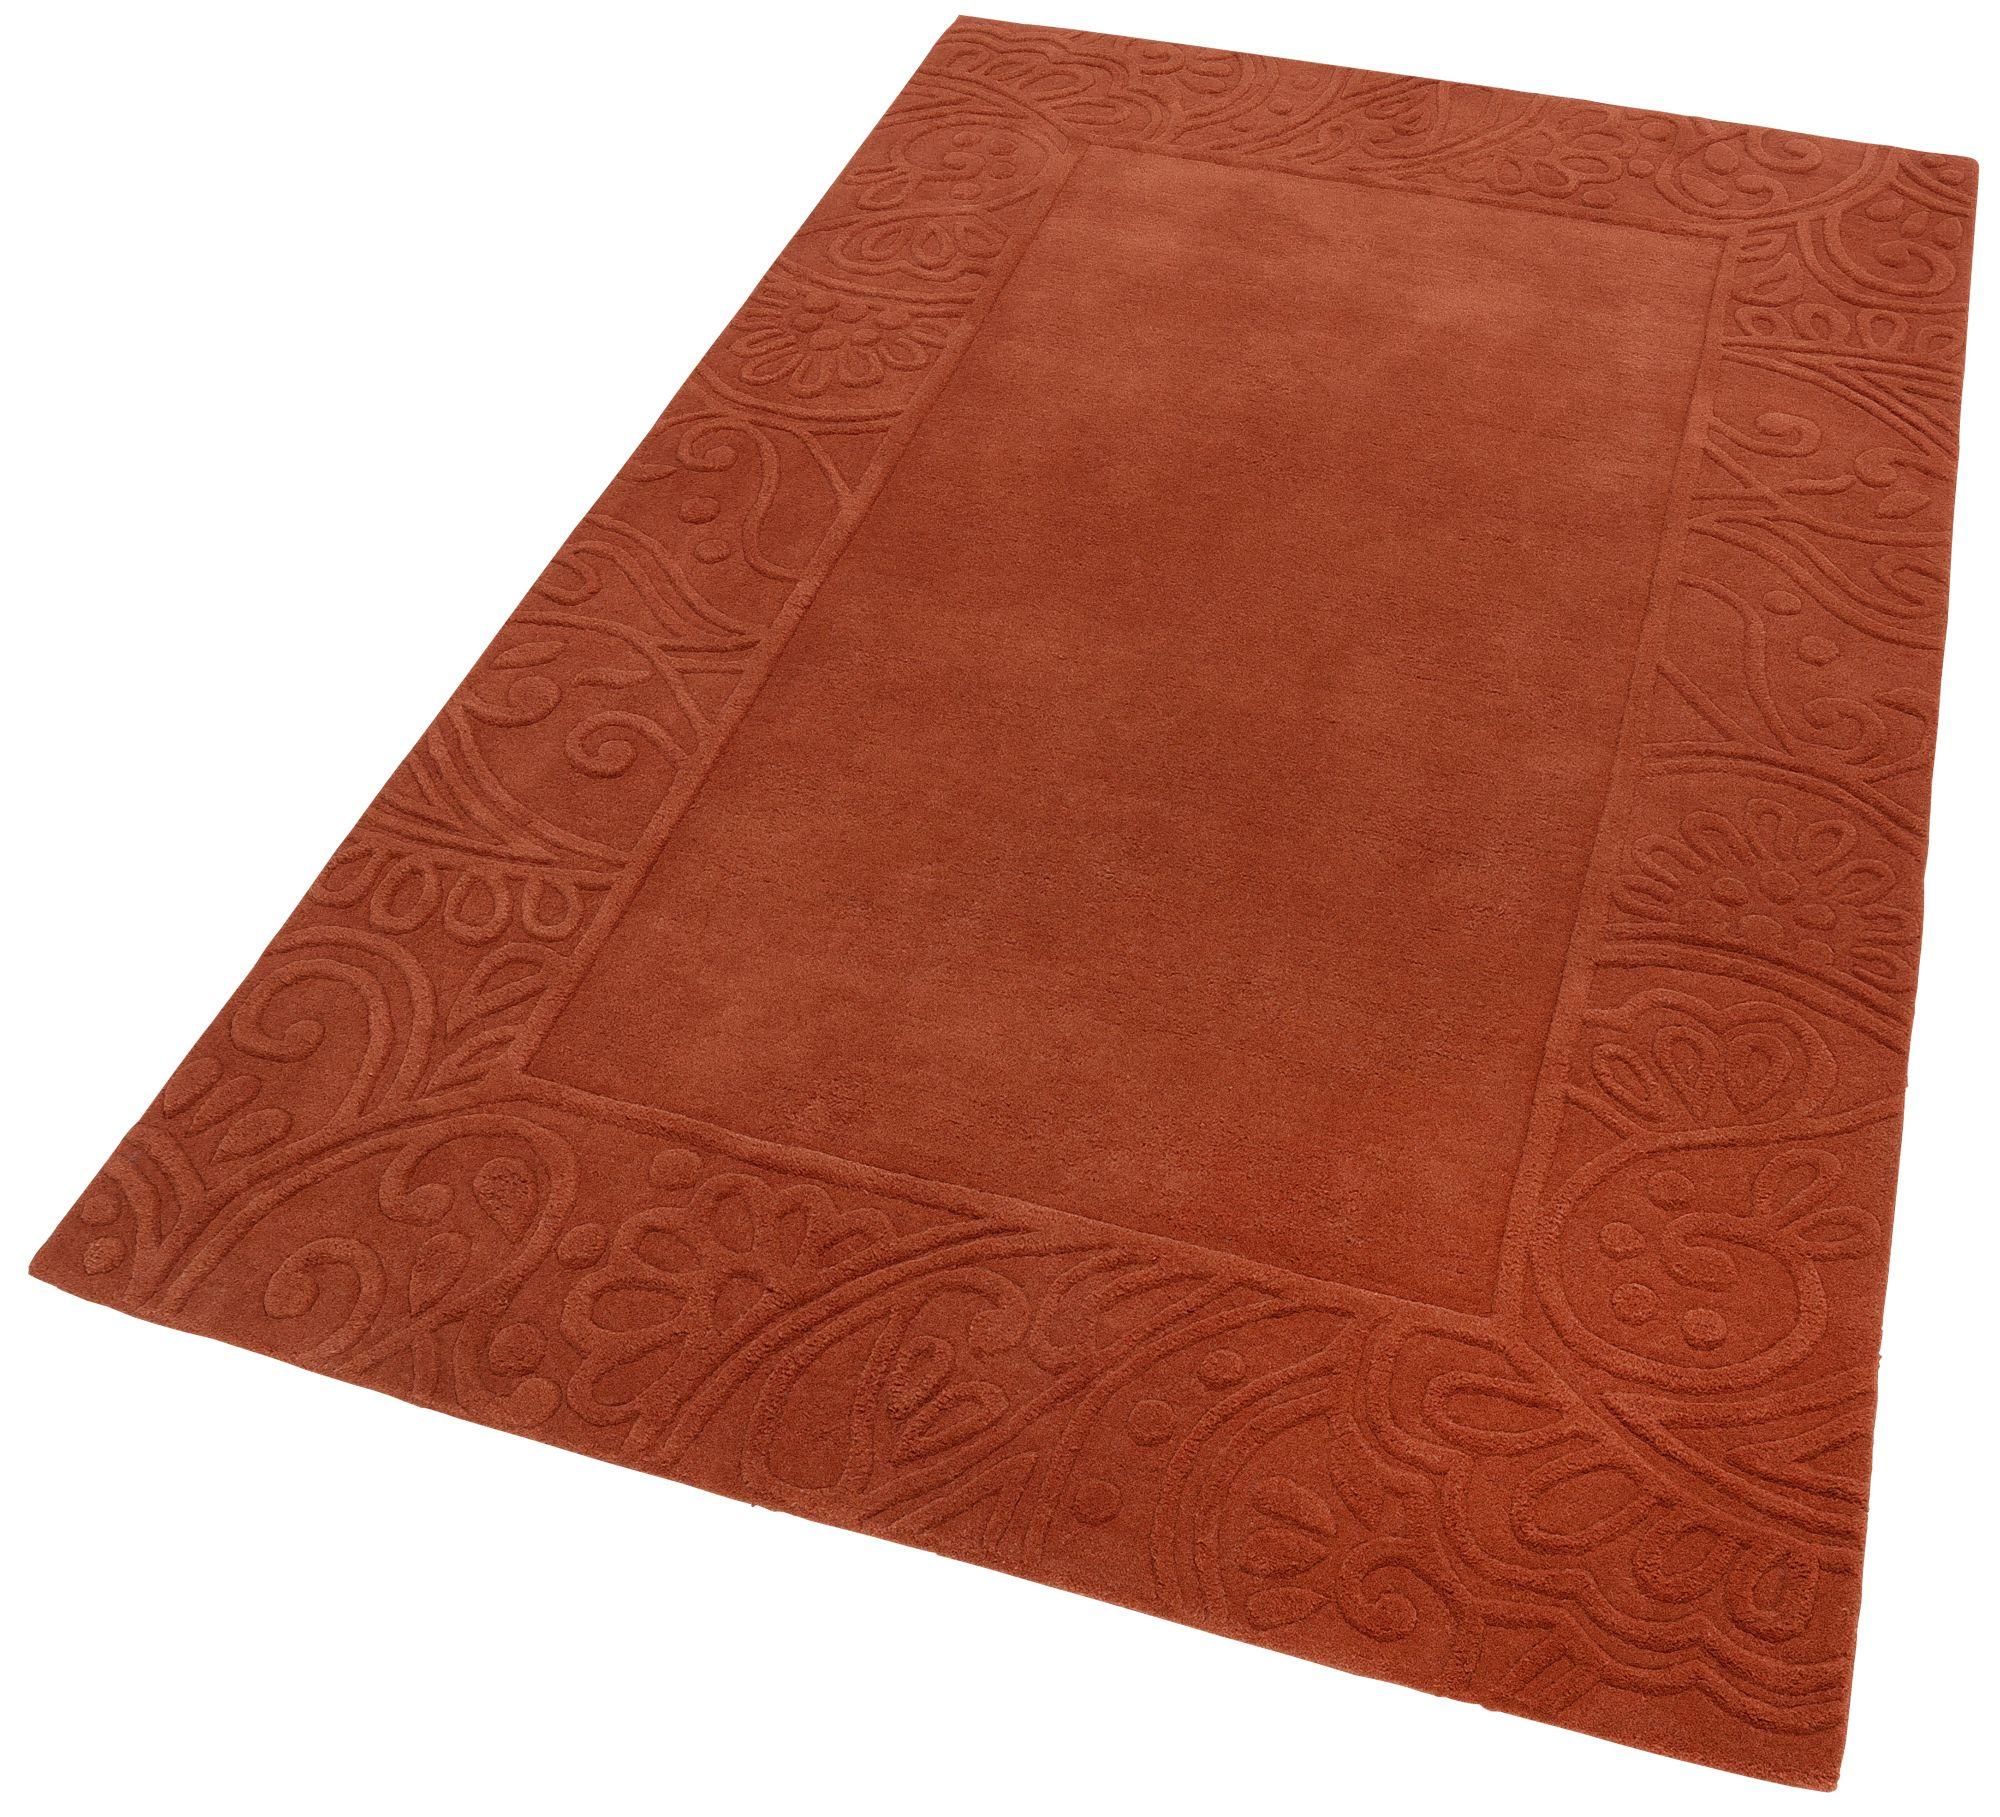 HOME AFFAIRE COLLECTION Teppich, Home affaire Collection, »Bhakta«, Höhe 11 mm, handgetuftet